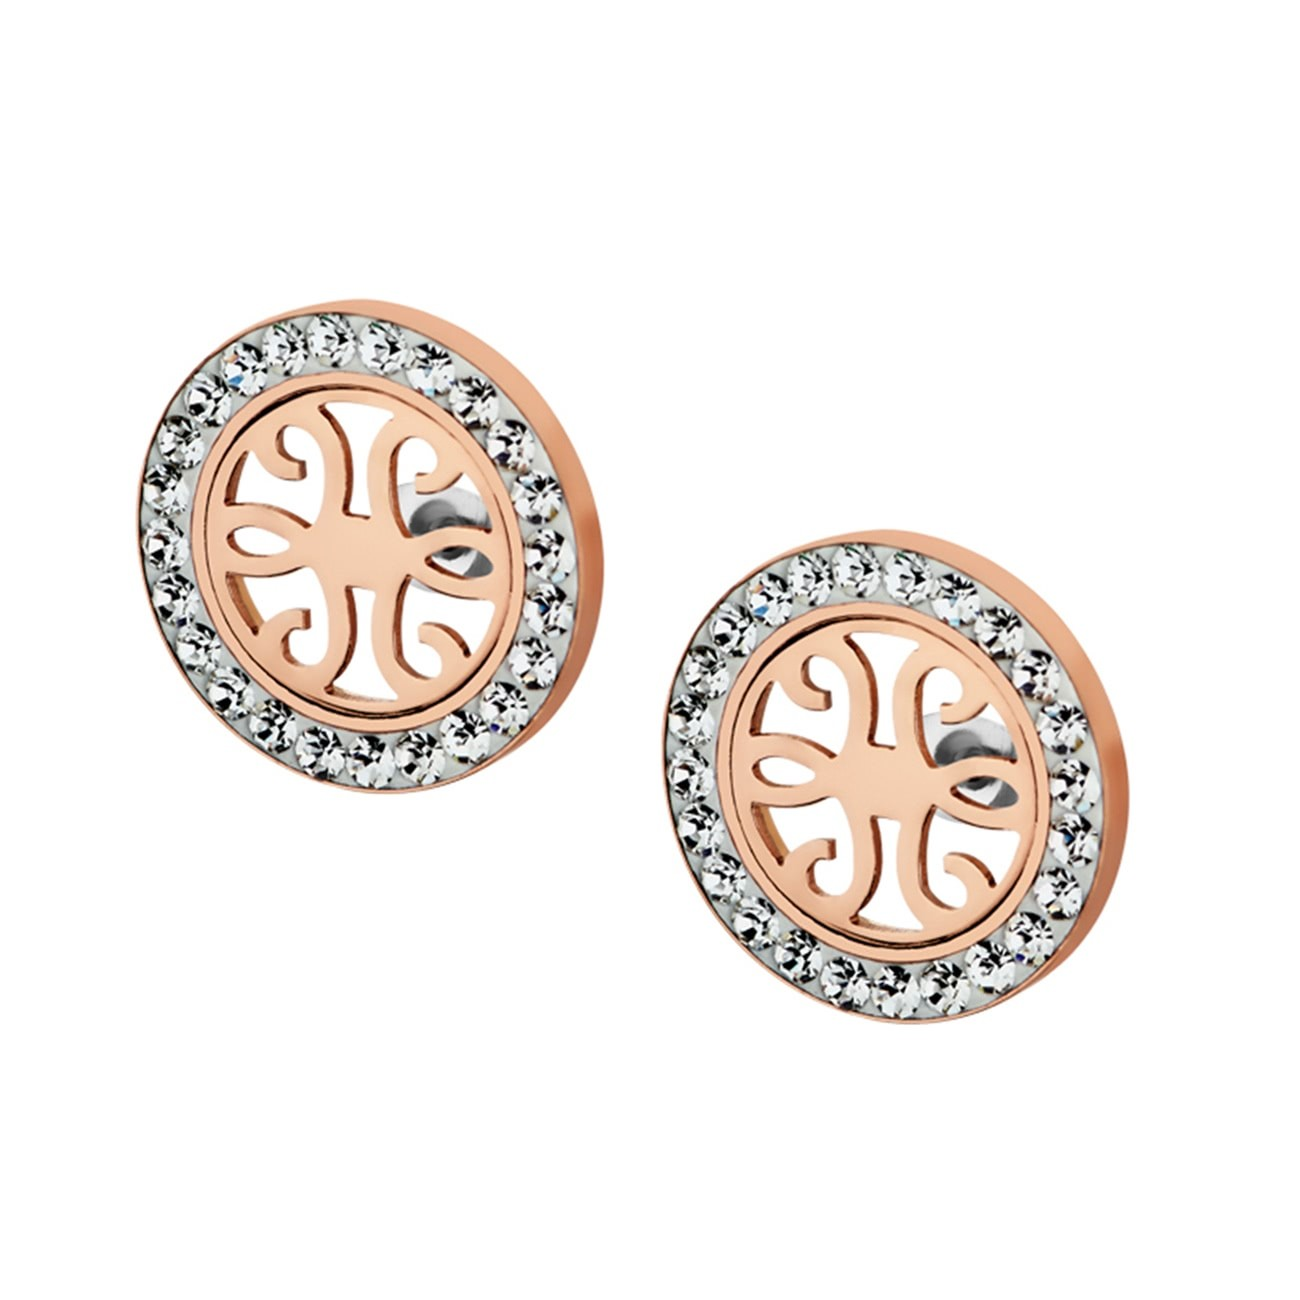 LOTUS Style Ohrringe Damen Edelstahl silber LS1779-4/2 Ohrstecker JLS1779-4-2